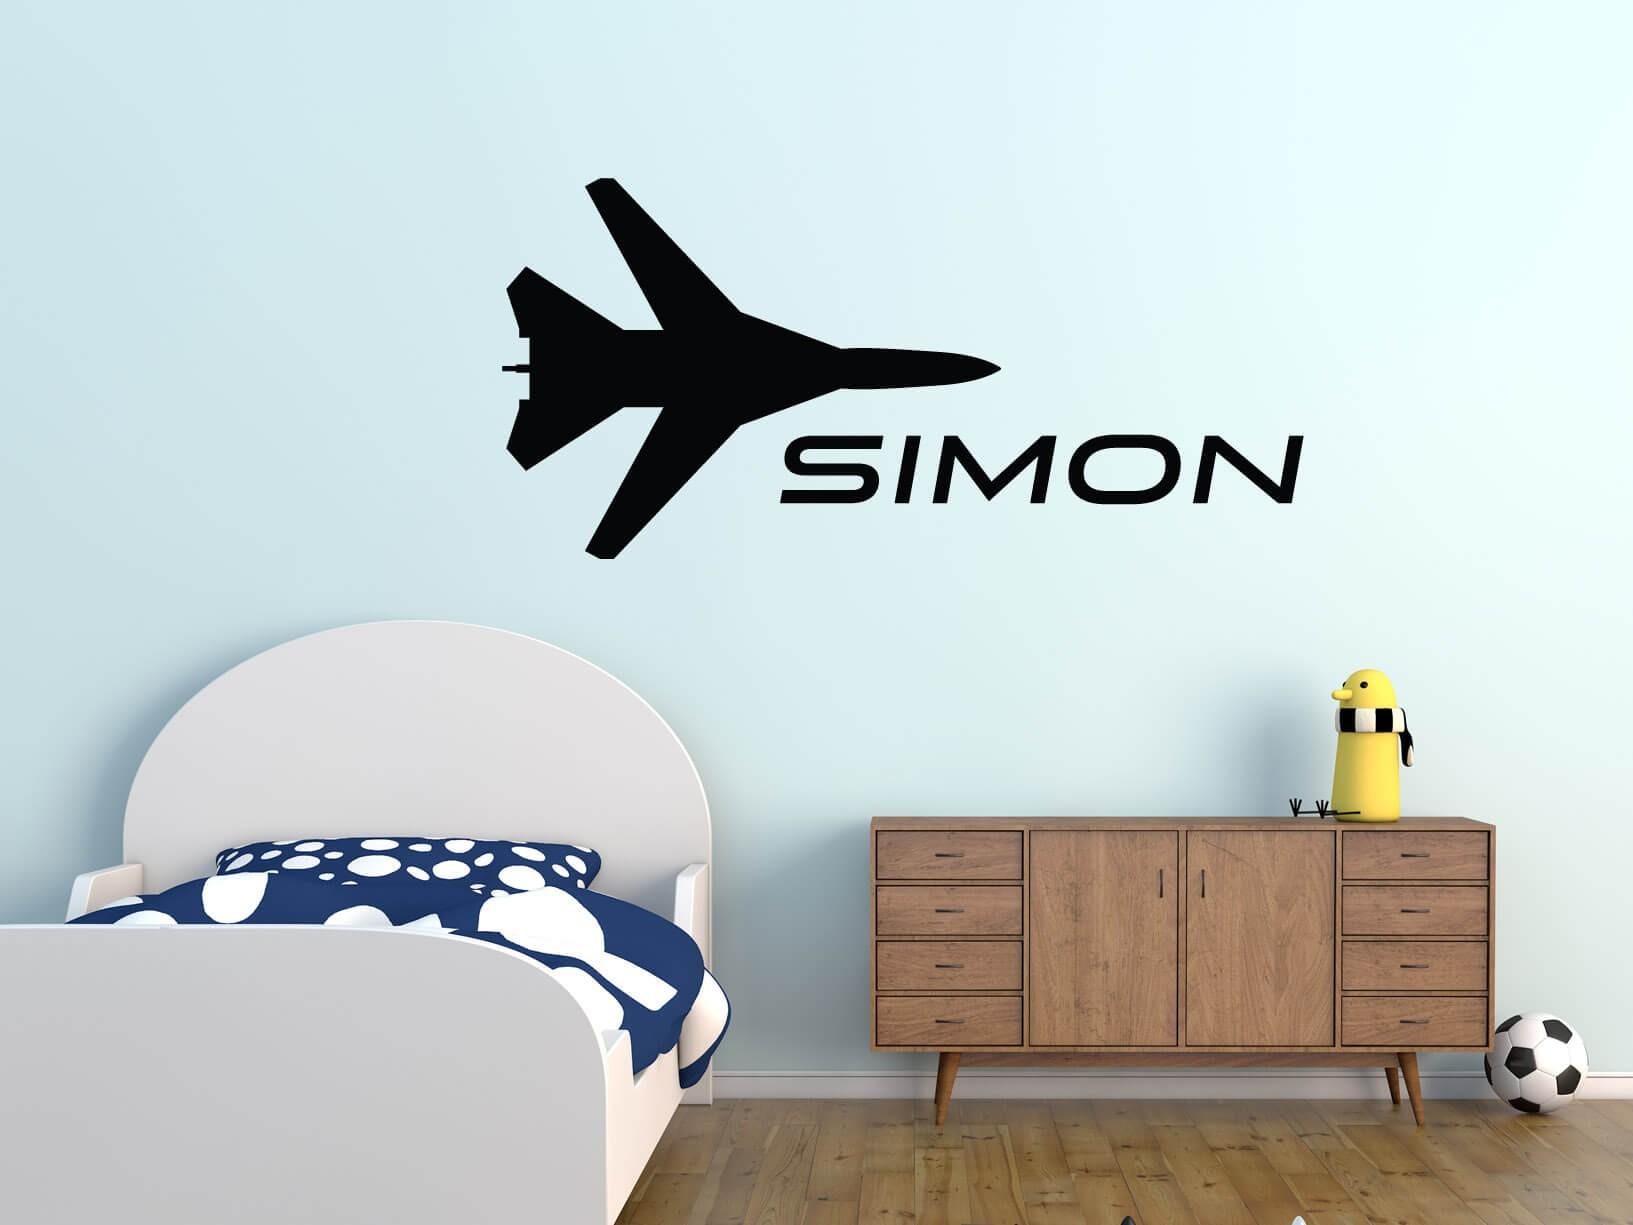 Muursticker vliegtuig met eigen tekst in stoere letters